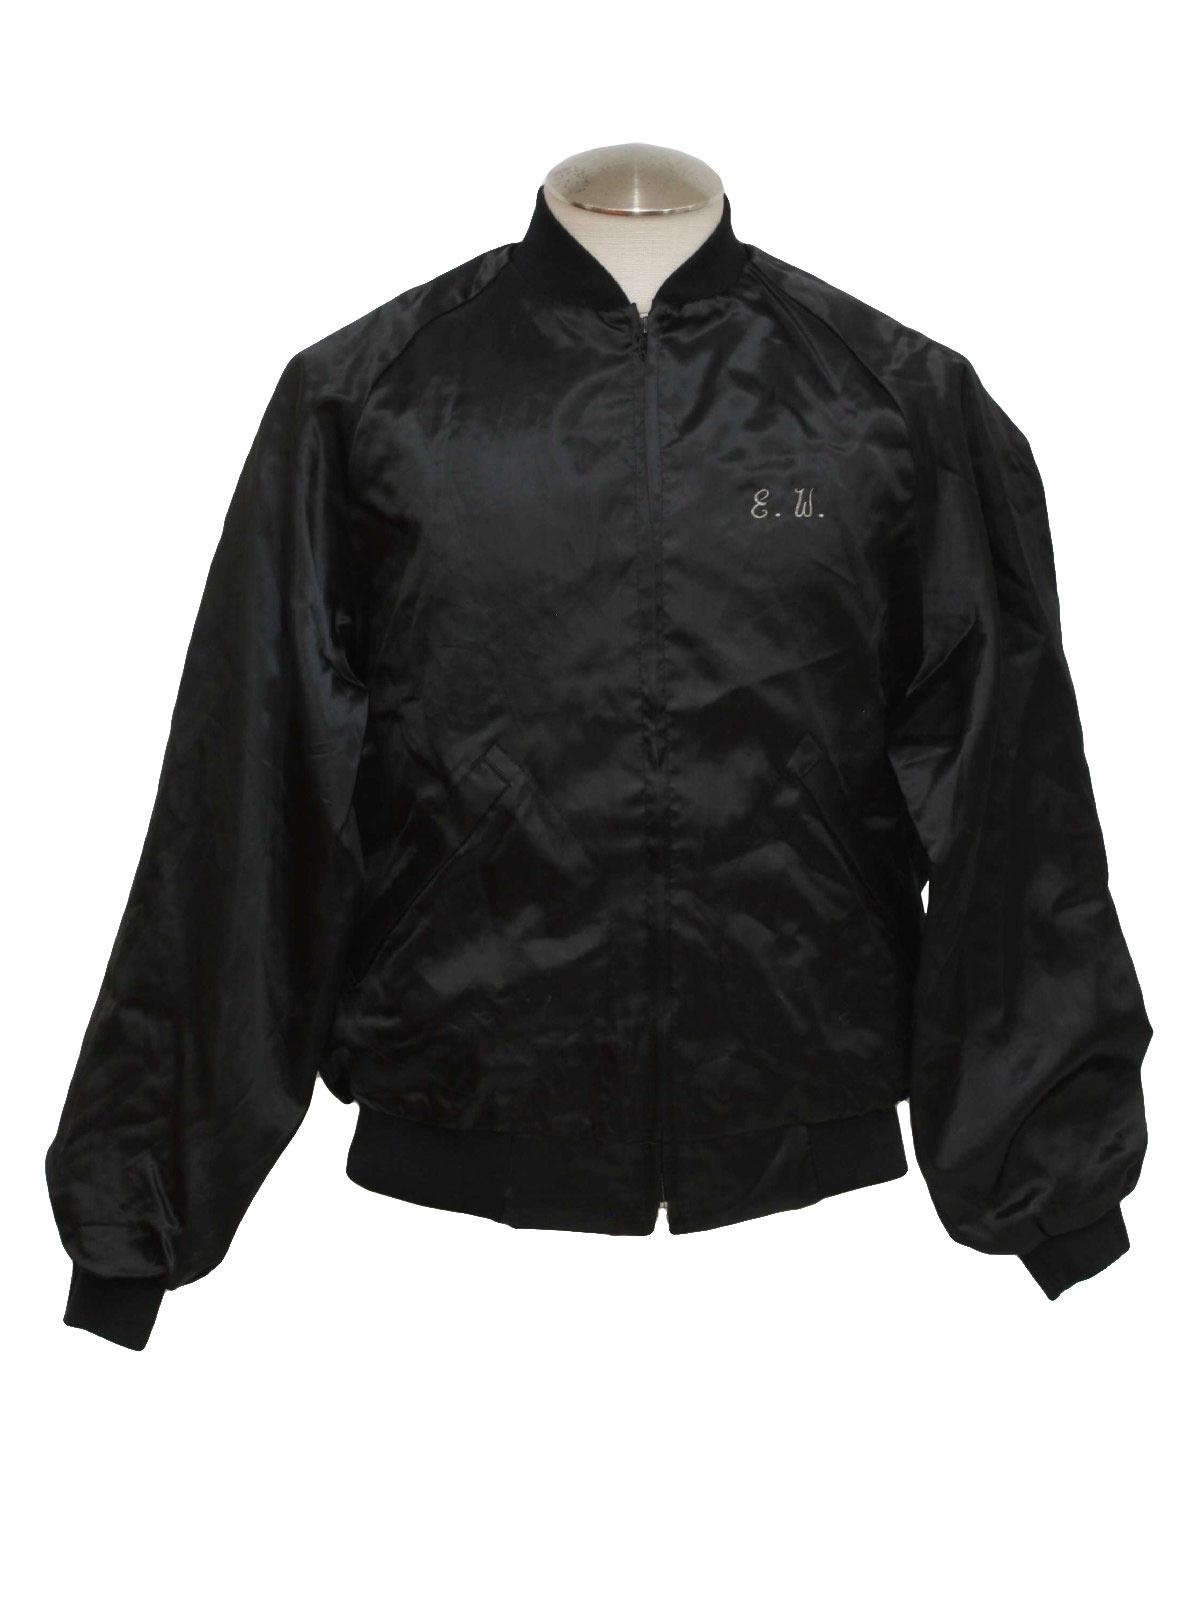 Retro 70&39s Jacket: 70s -Pla Jac- Mens black cotton lined shiny